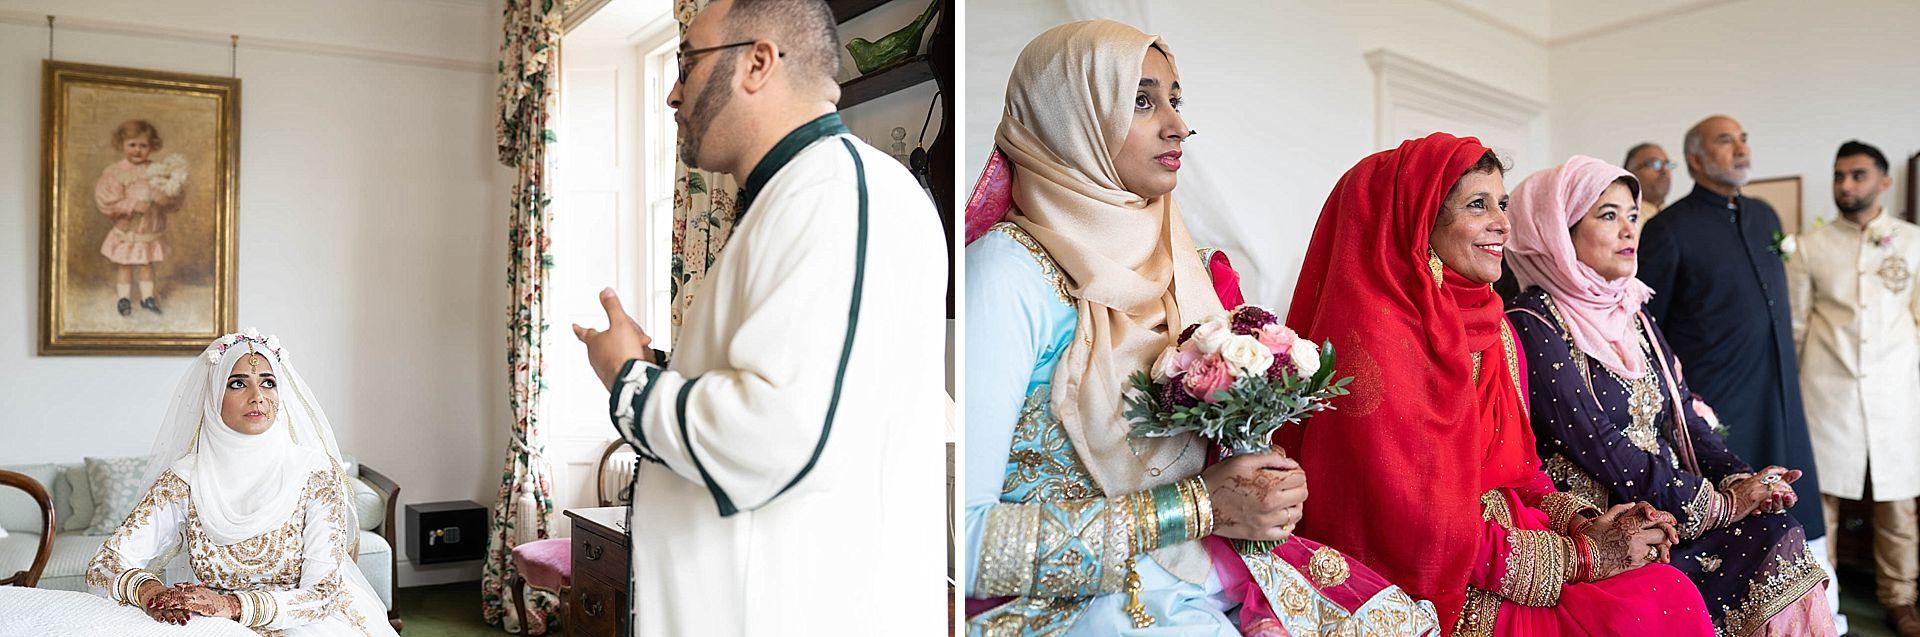 Poundon House Muslim Wedding